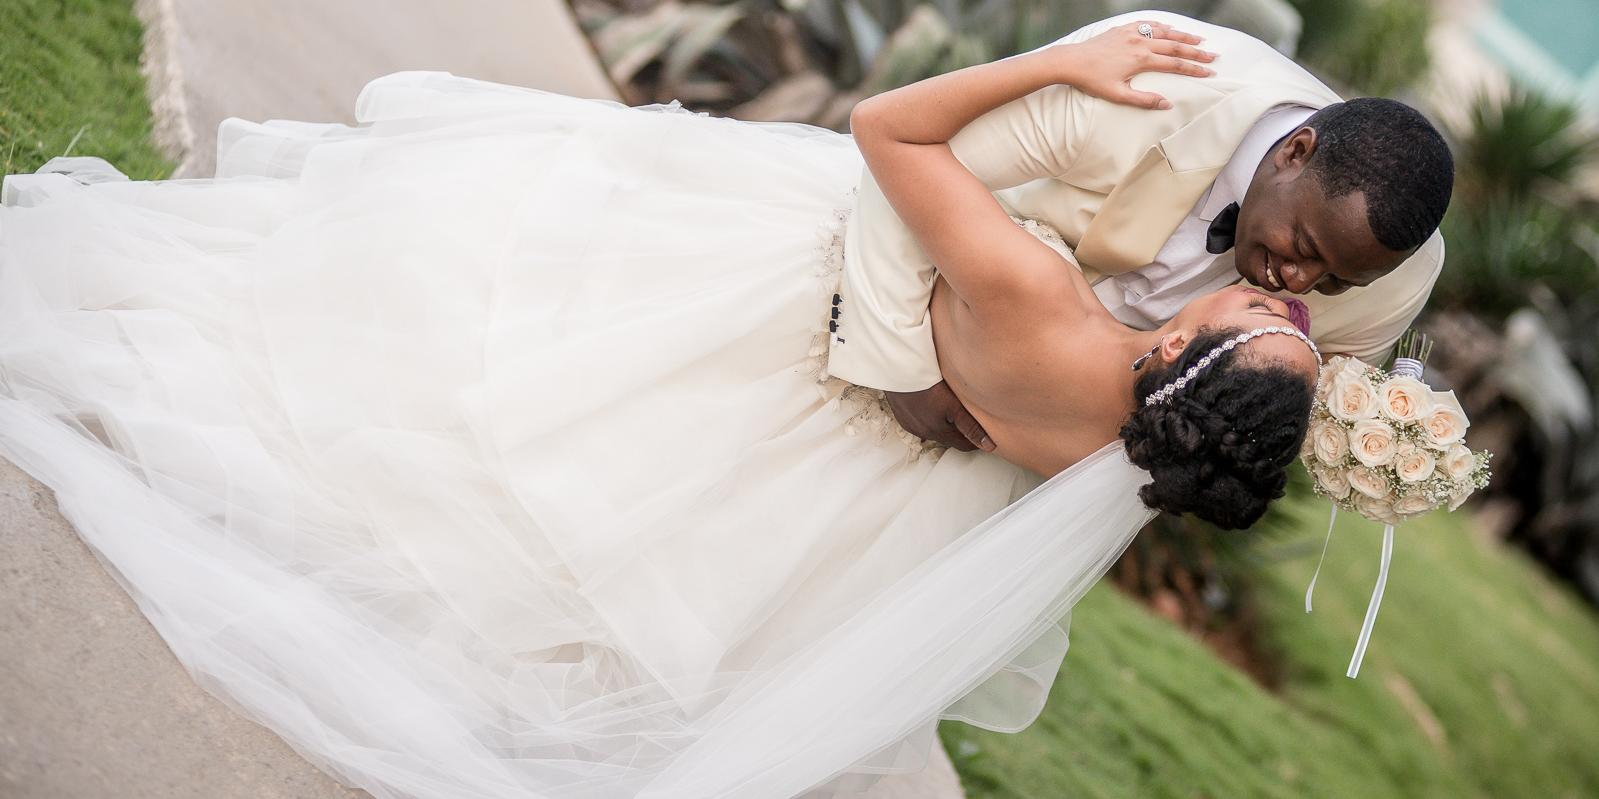 bodas-estilo-libre-jardin-cuba-9471.jpg